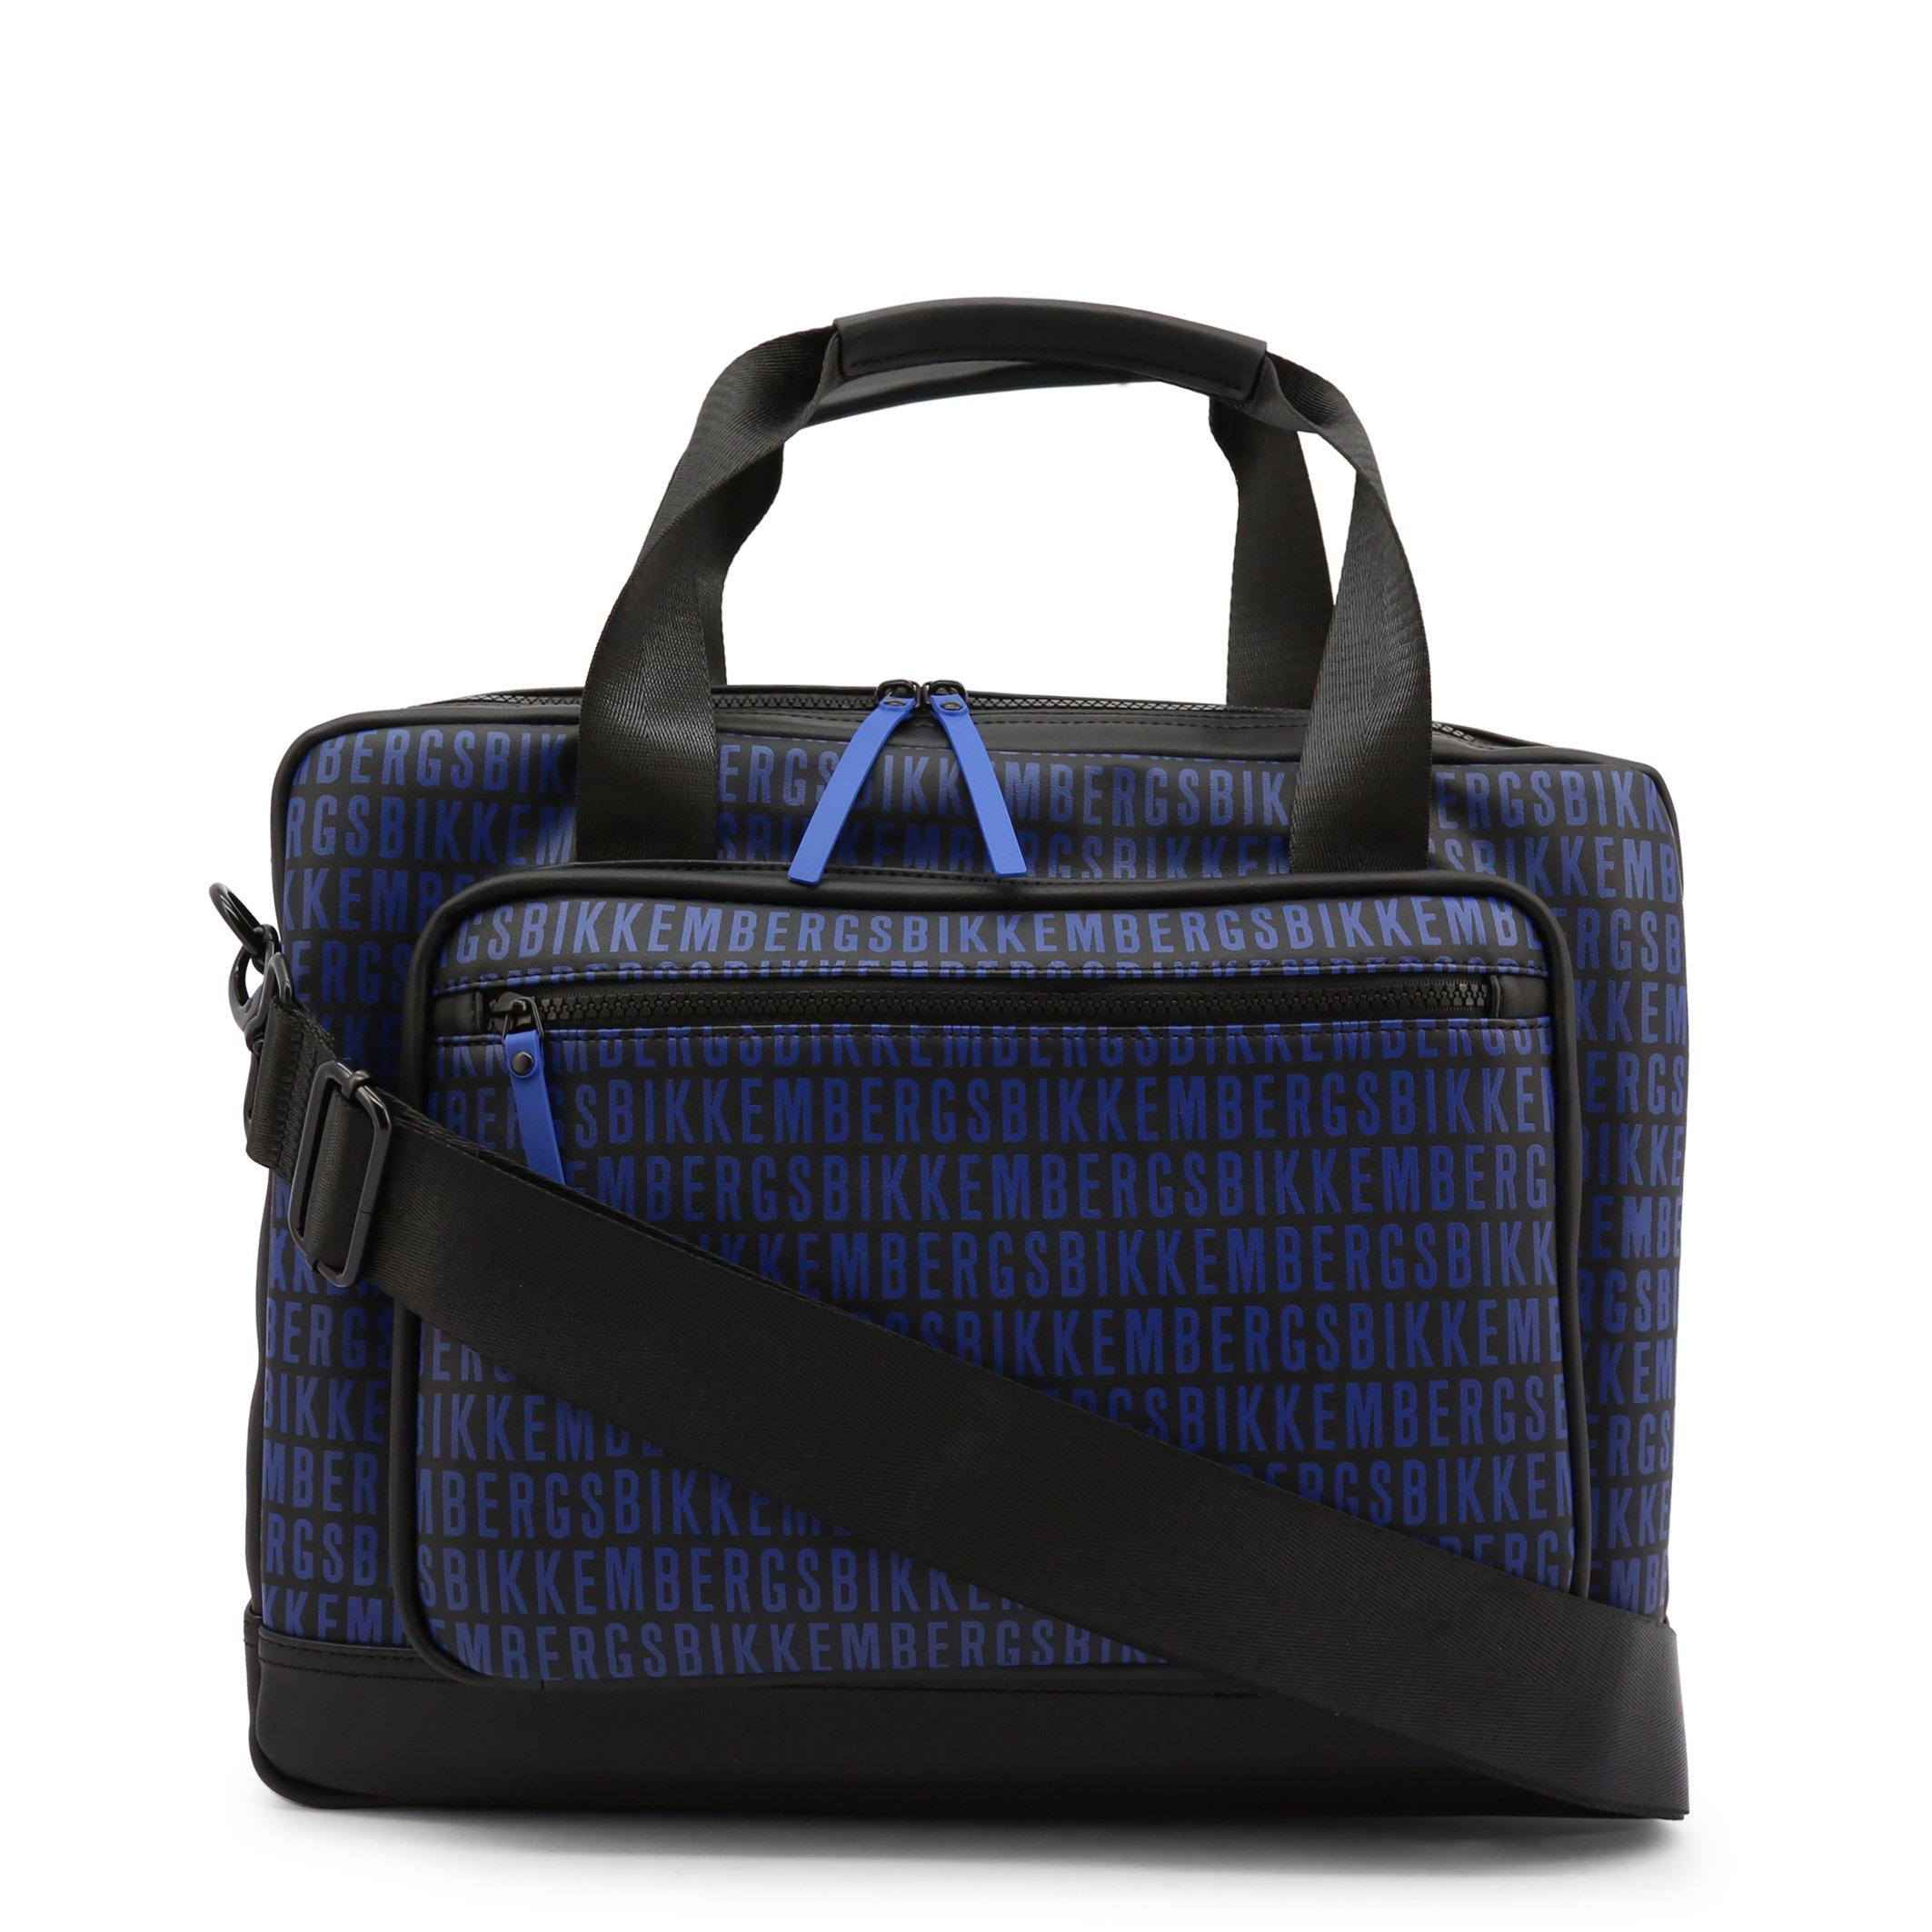 Bikkembergs Men's Briefcase Black E2APME81005C - black-2 NOSIZE